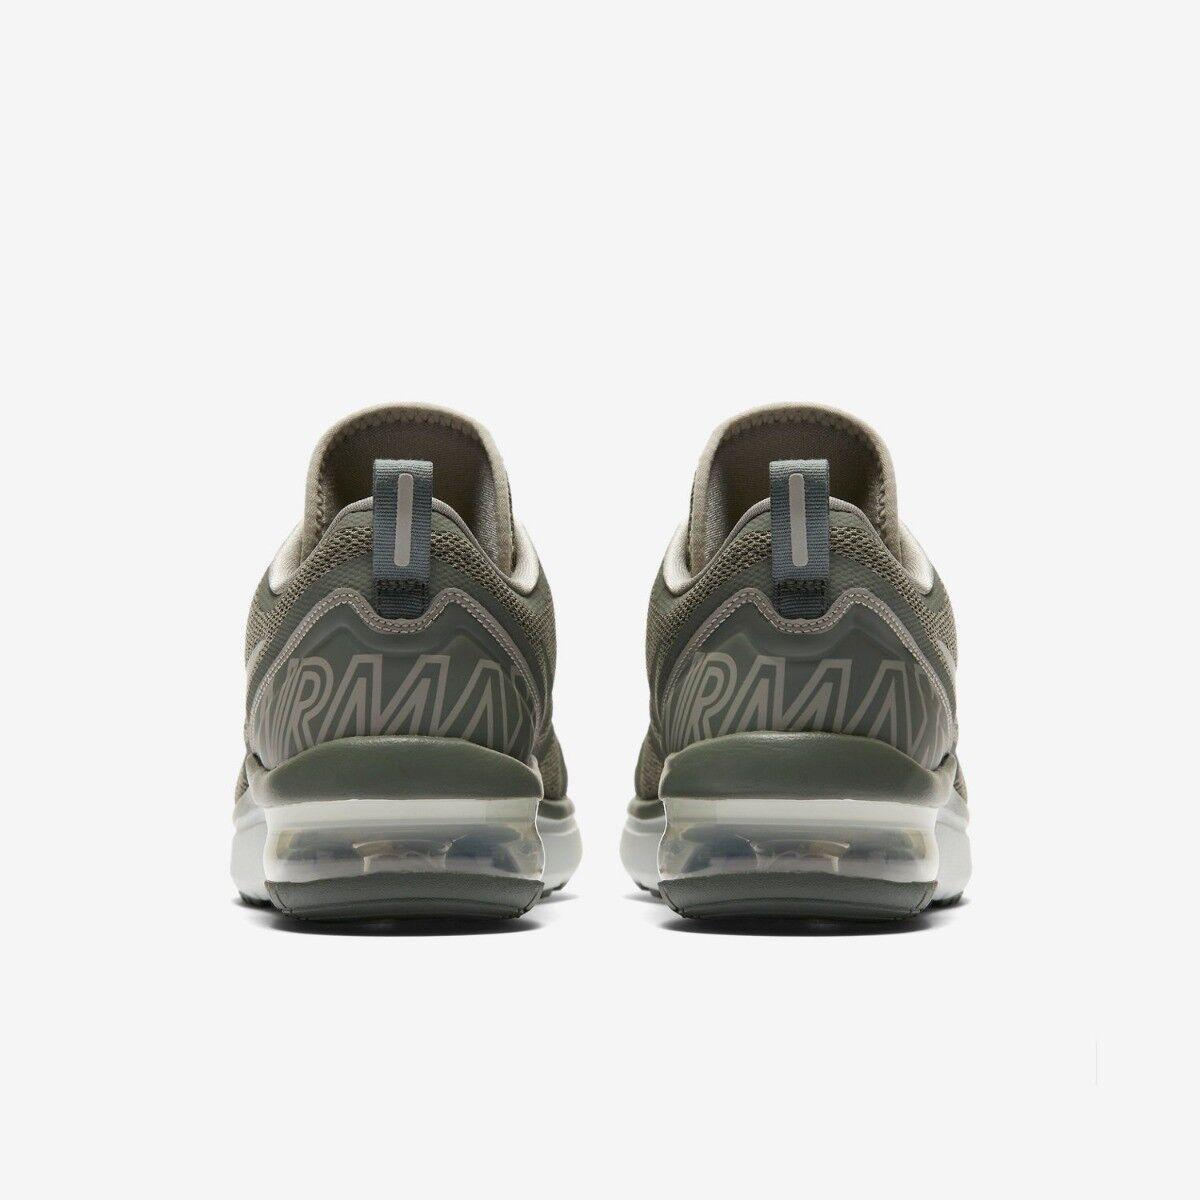 Nike Air Max Furia Furia Furia Hombre Para Correr Zapatilla Zapato Río Rock 8 - 10.5 nuevo PVP  - 674602